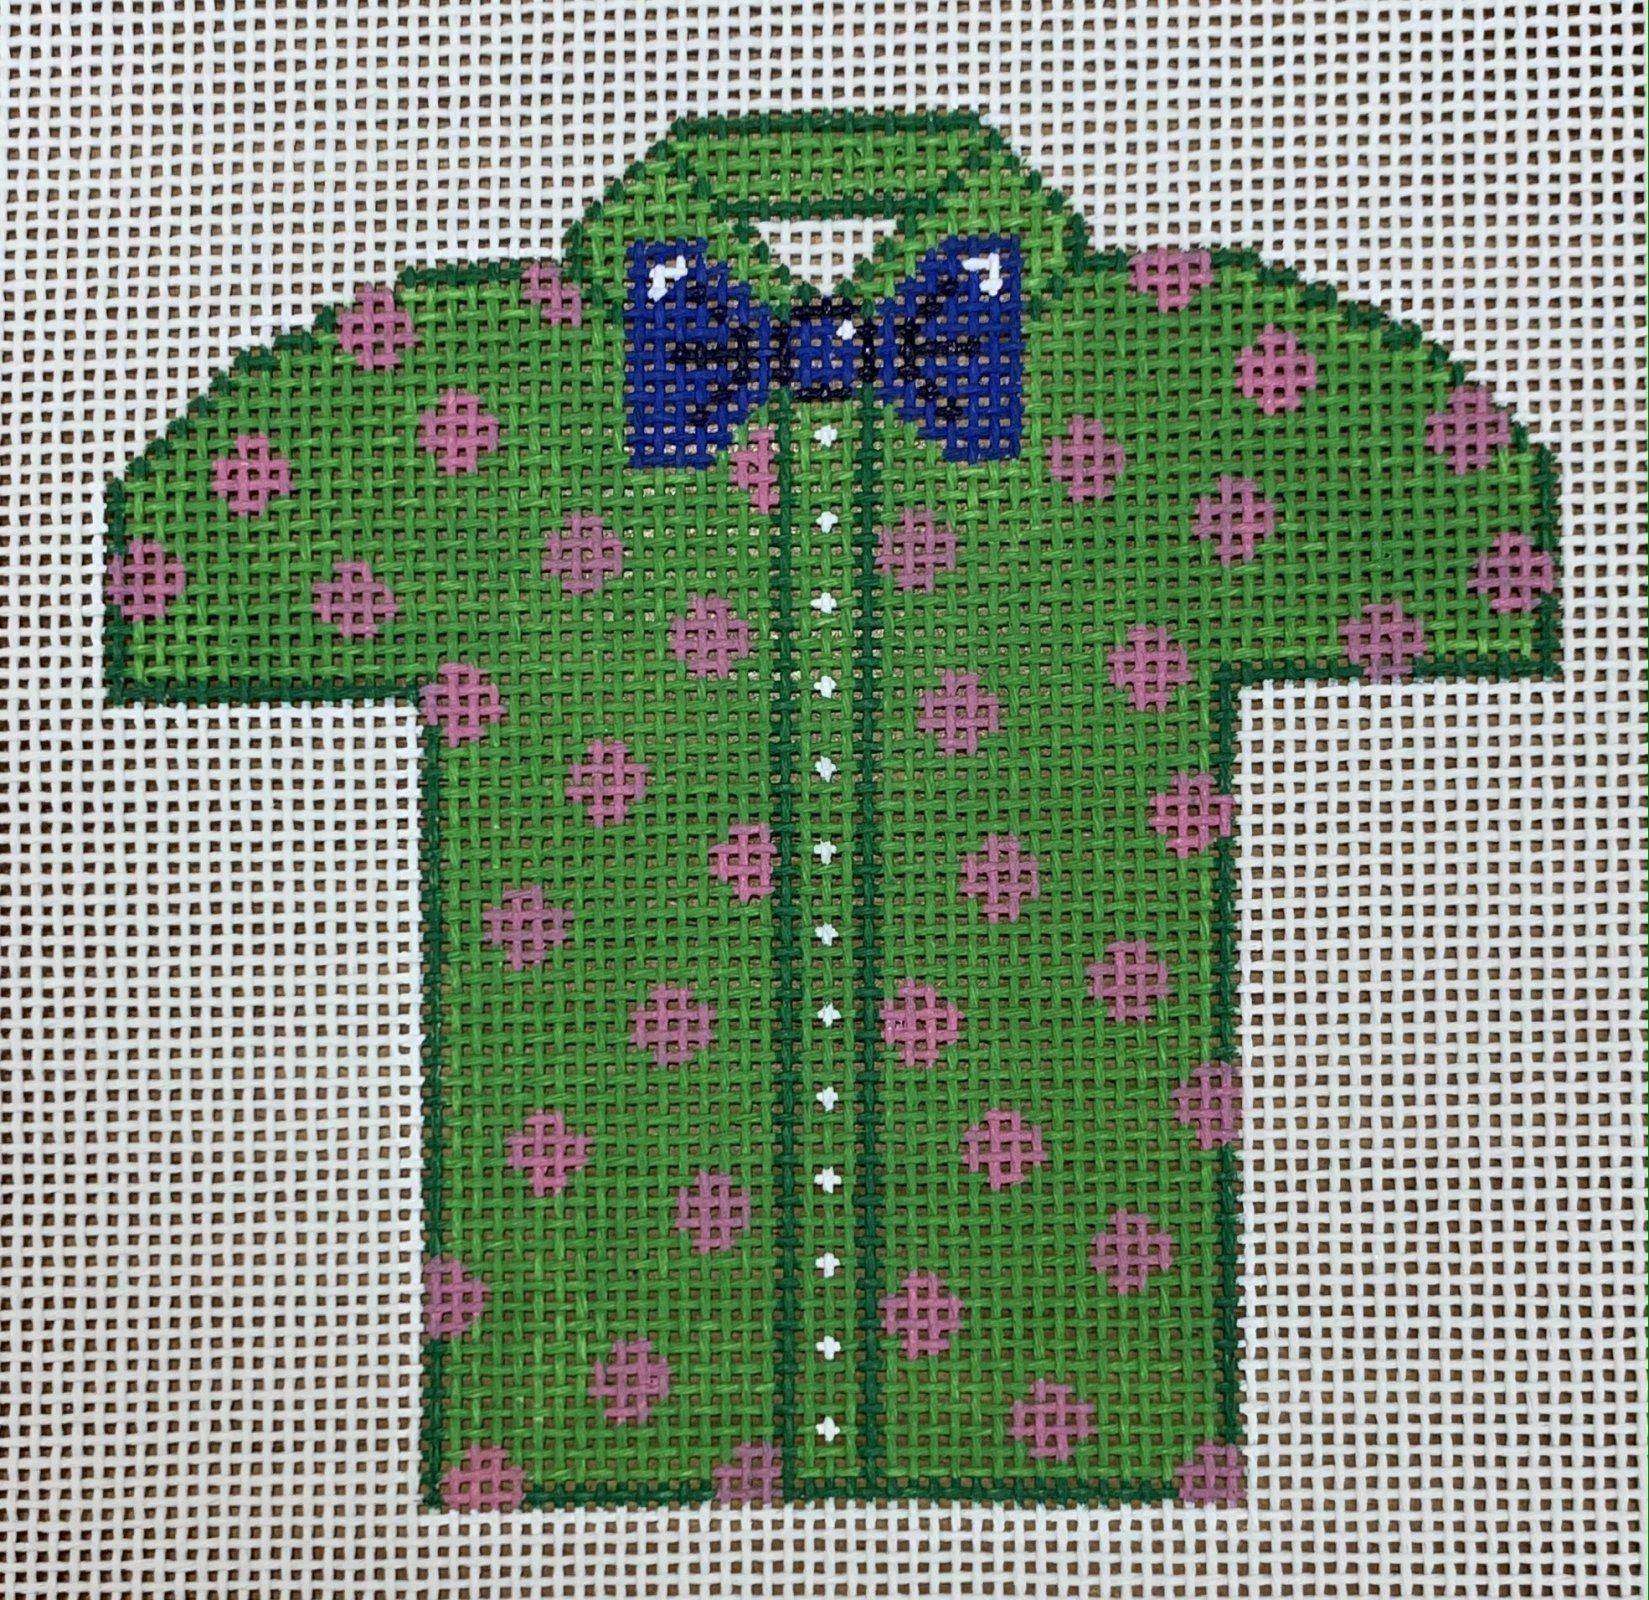 Men's Shirt - Green with Polka Dot